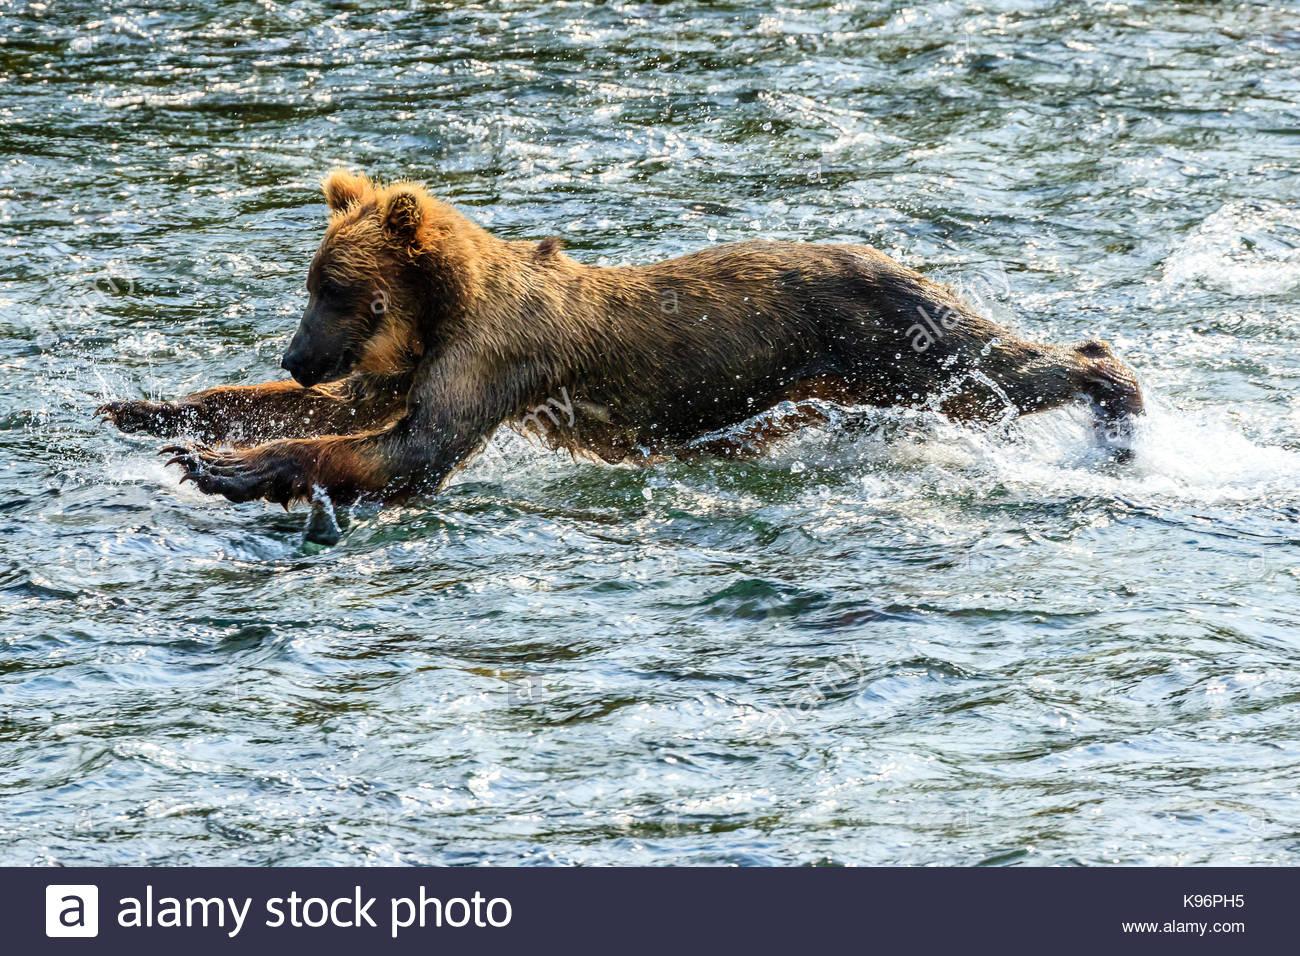 Yearling brown bear, Ursus arctos, fishing for salmon below Brooks Falls. - Stock Image